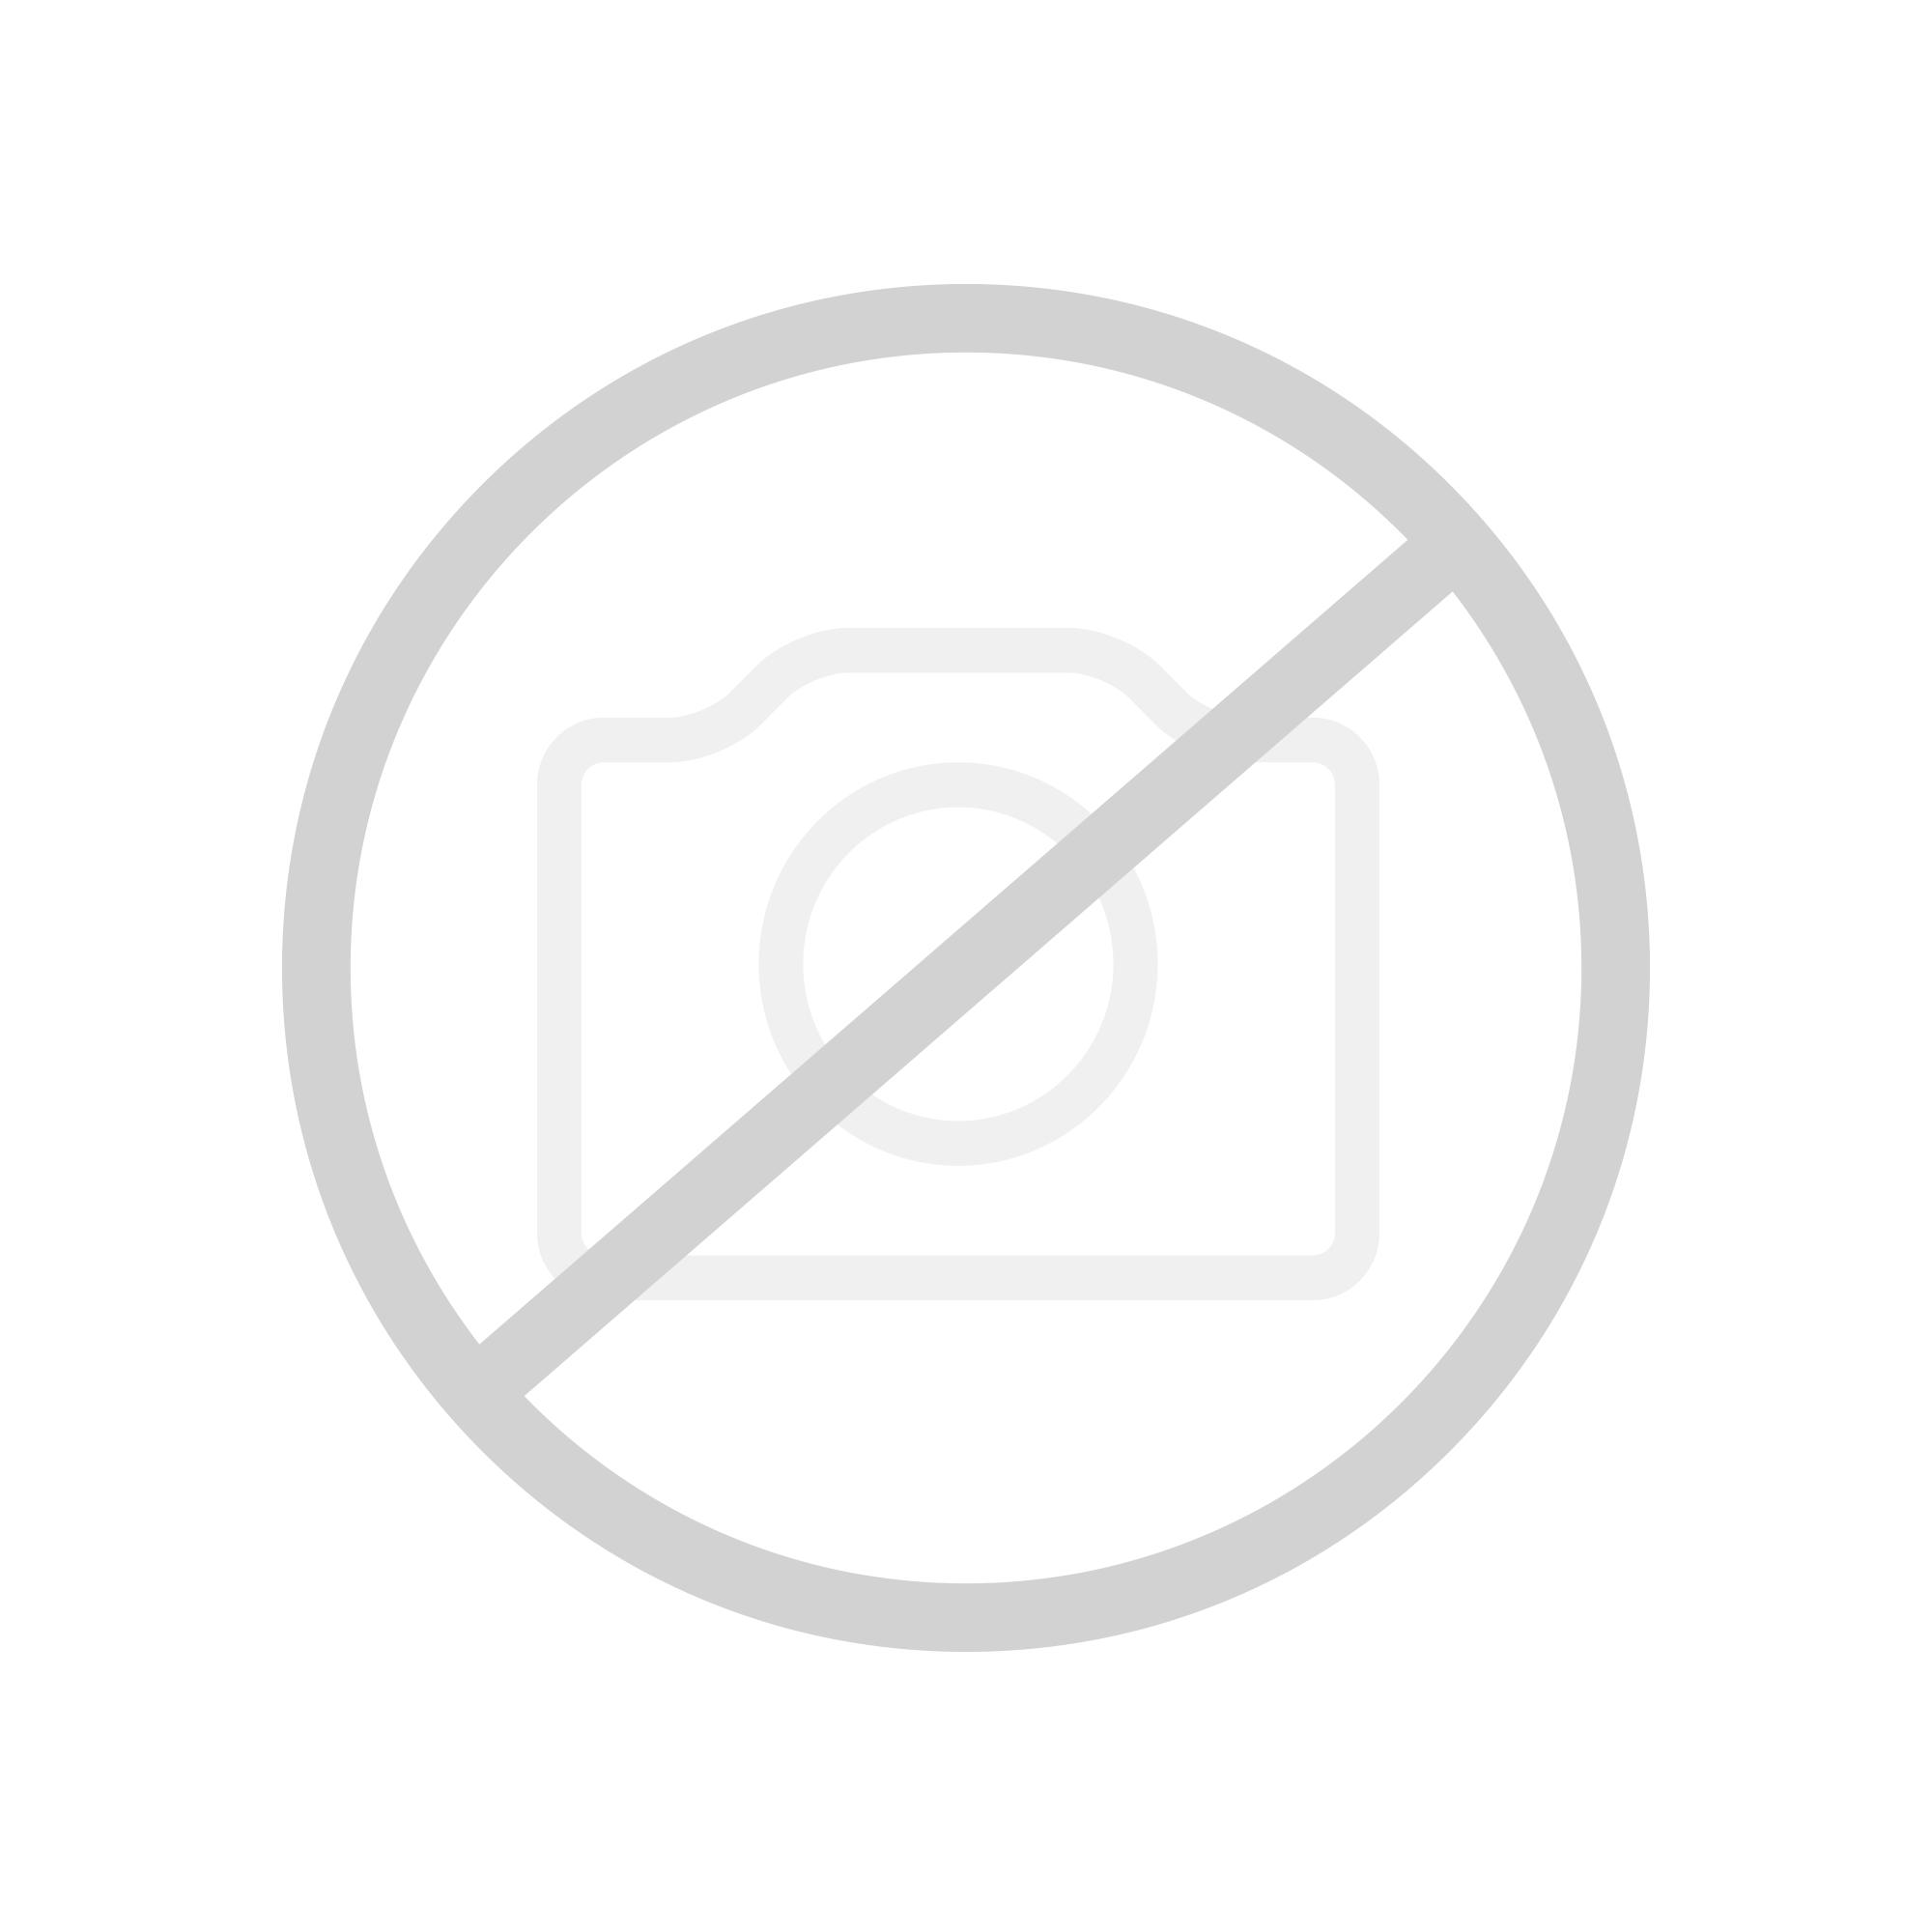 hsk f nfeck duschwanne superflach weiss ohne sch rze 515090 04 reuter onlineshop. Black Bedroom Furniture Sets. Home Design Ideas